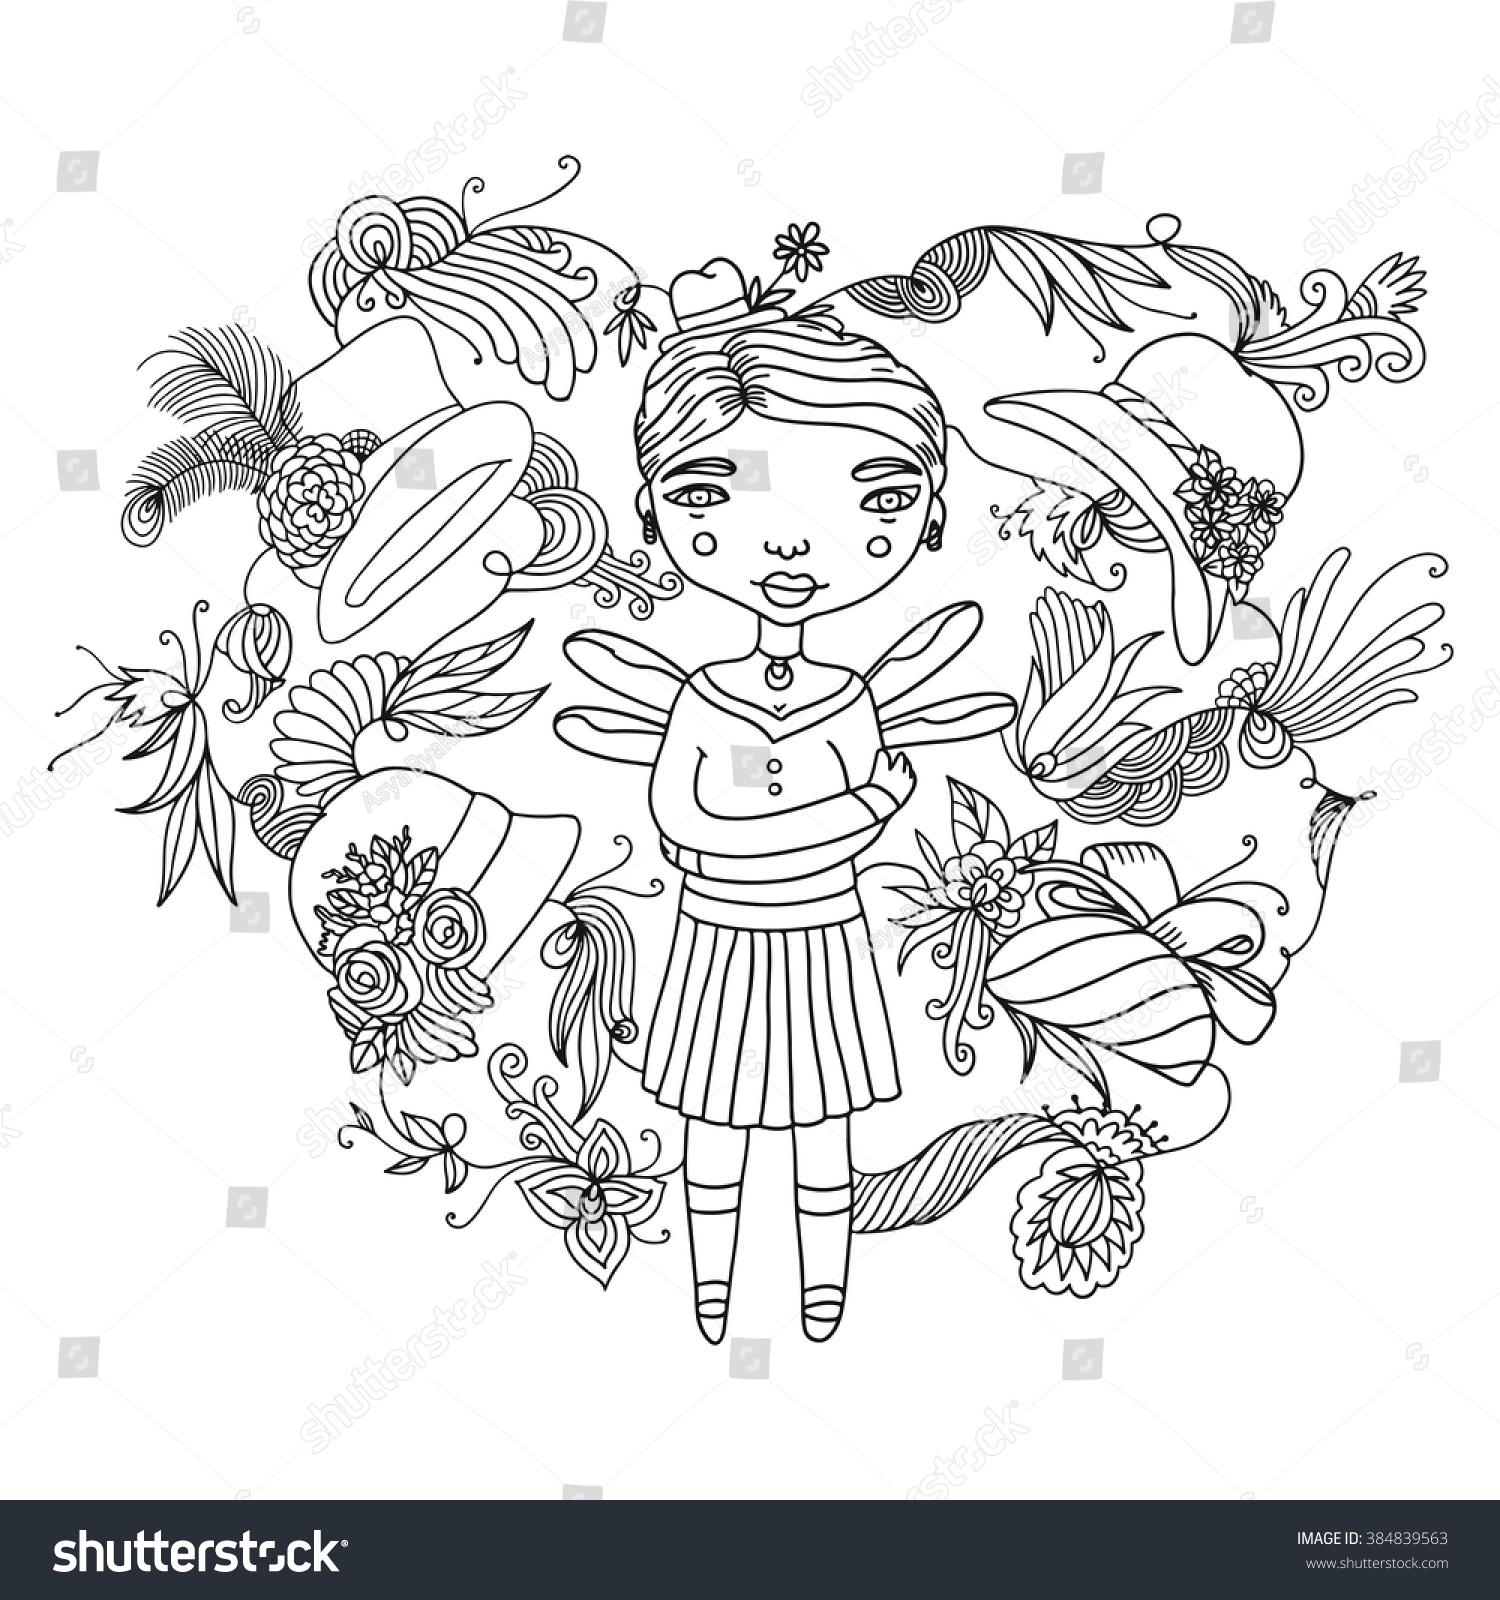 Doodles Womenelf Hats Stock Photo (Photo, Vector, Illustration ...